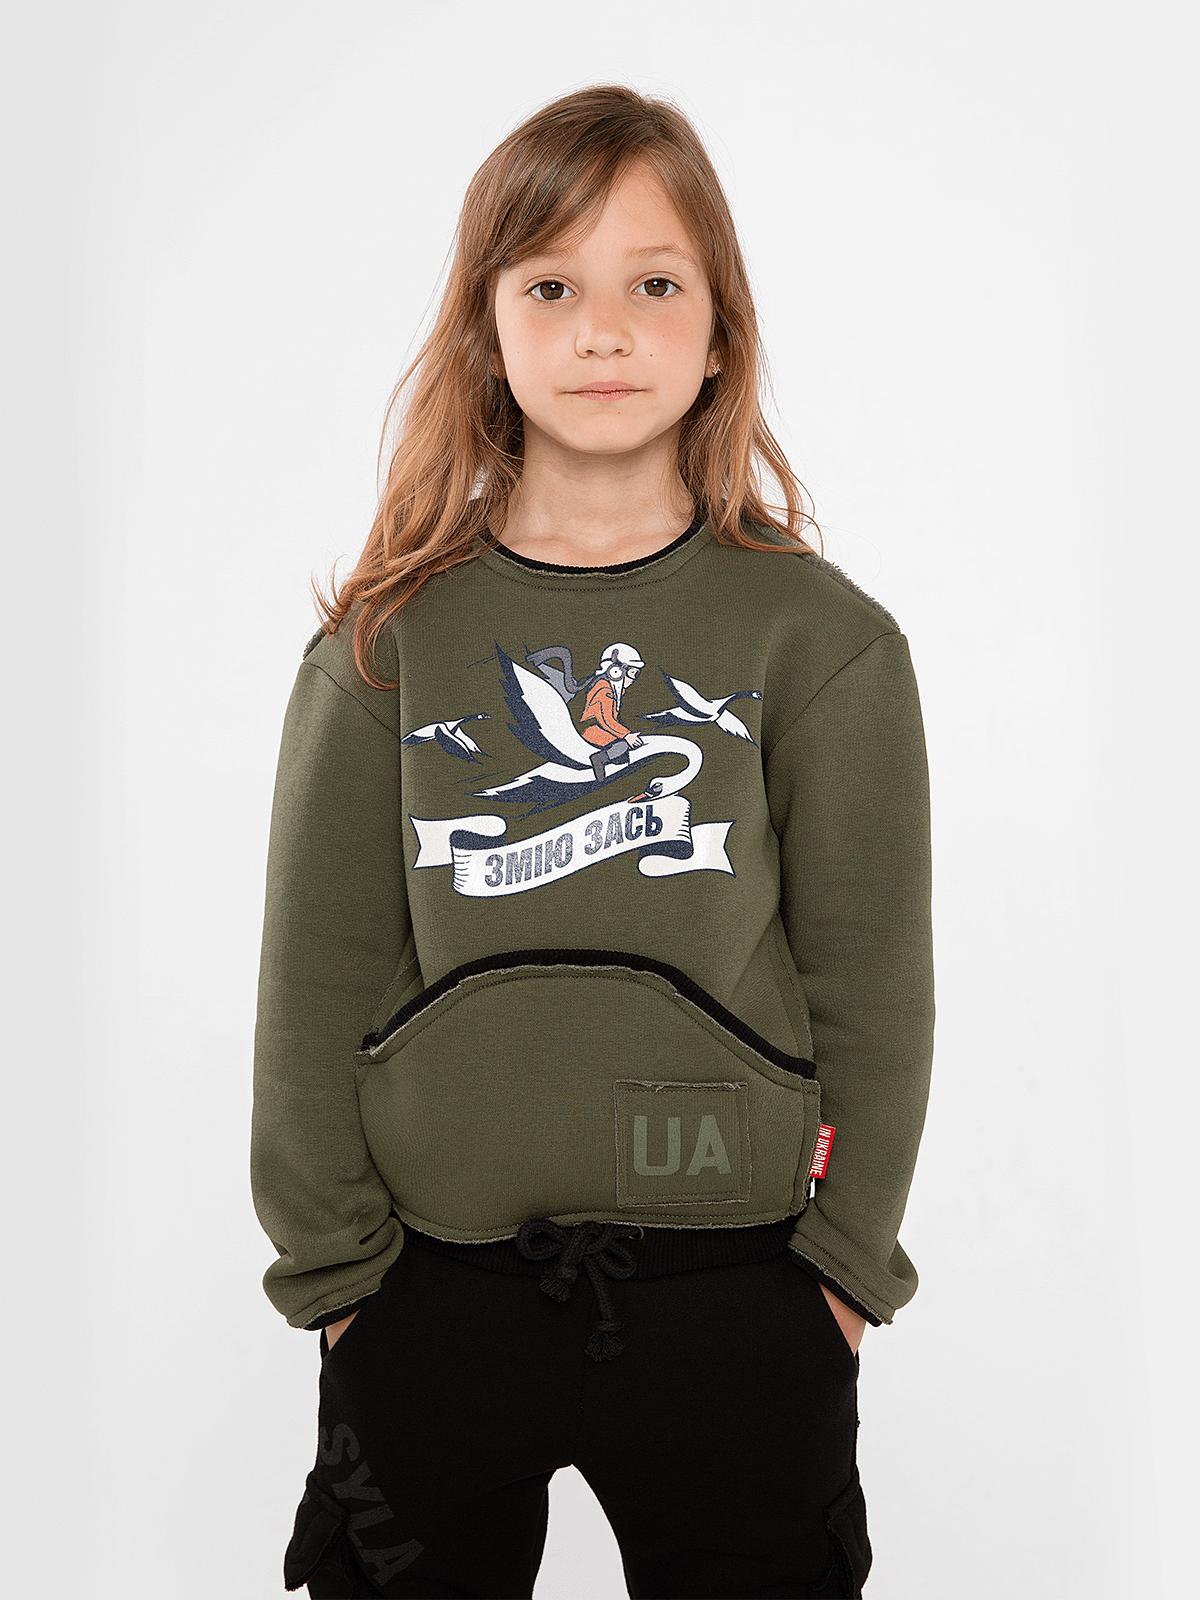 Kids Sweatshirt Dragon Won't Get It!. Color khaki.  Technique of prints applied: silkscreen printing.